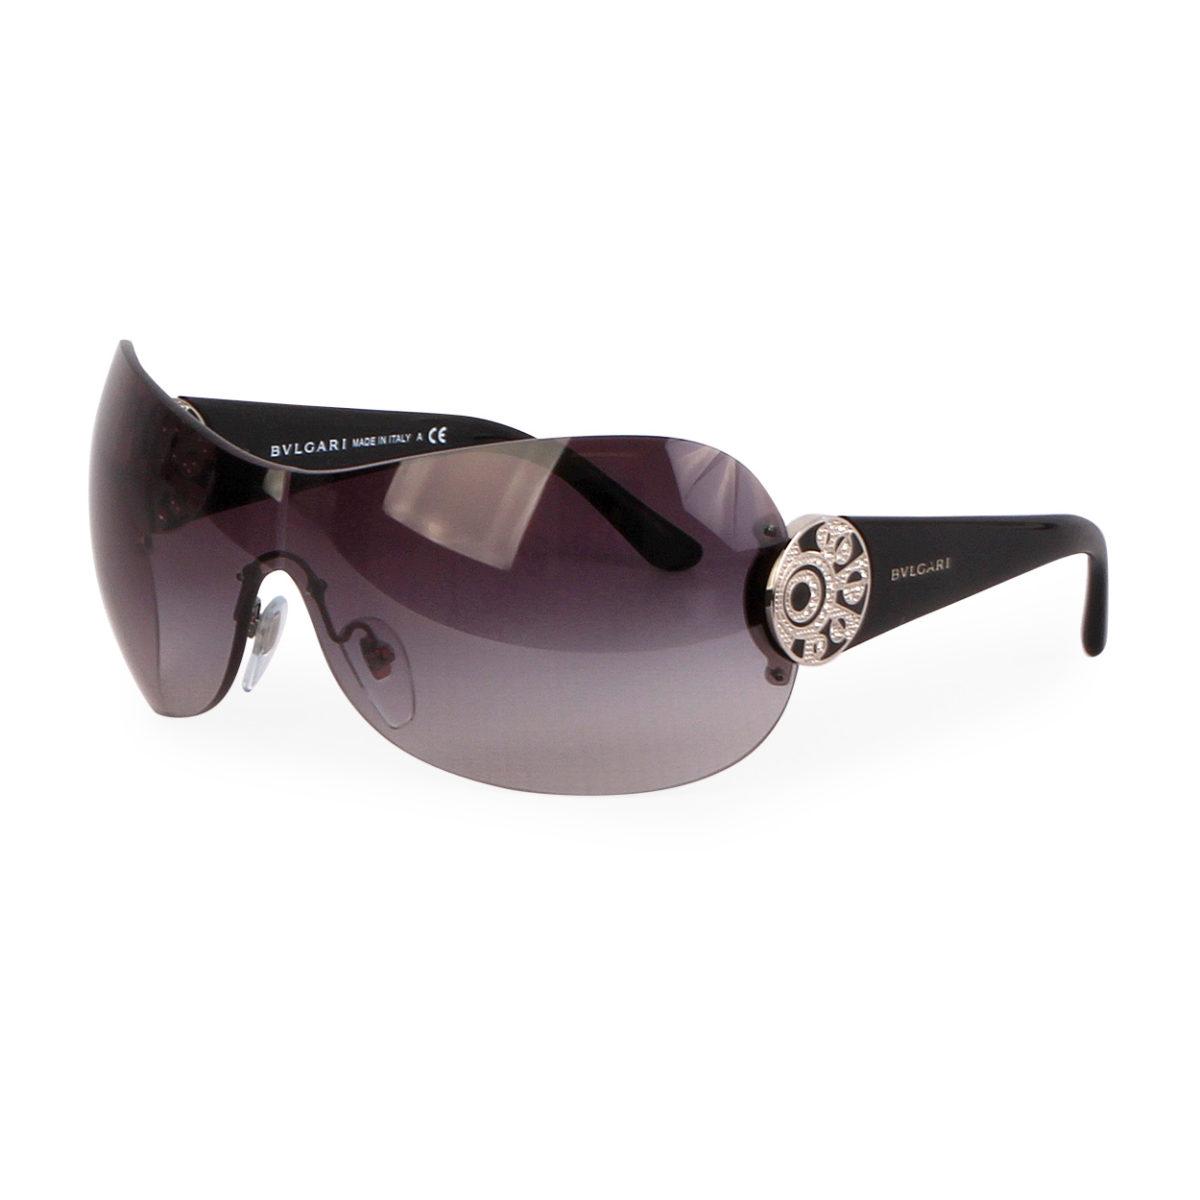 6e5d83f4364 BVLGARI Swarovski Crystal Sunglasses 6074 B Black